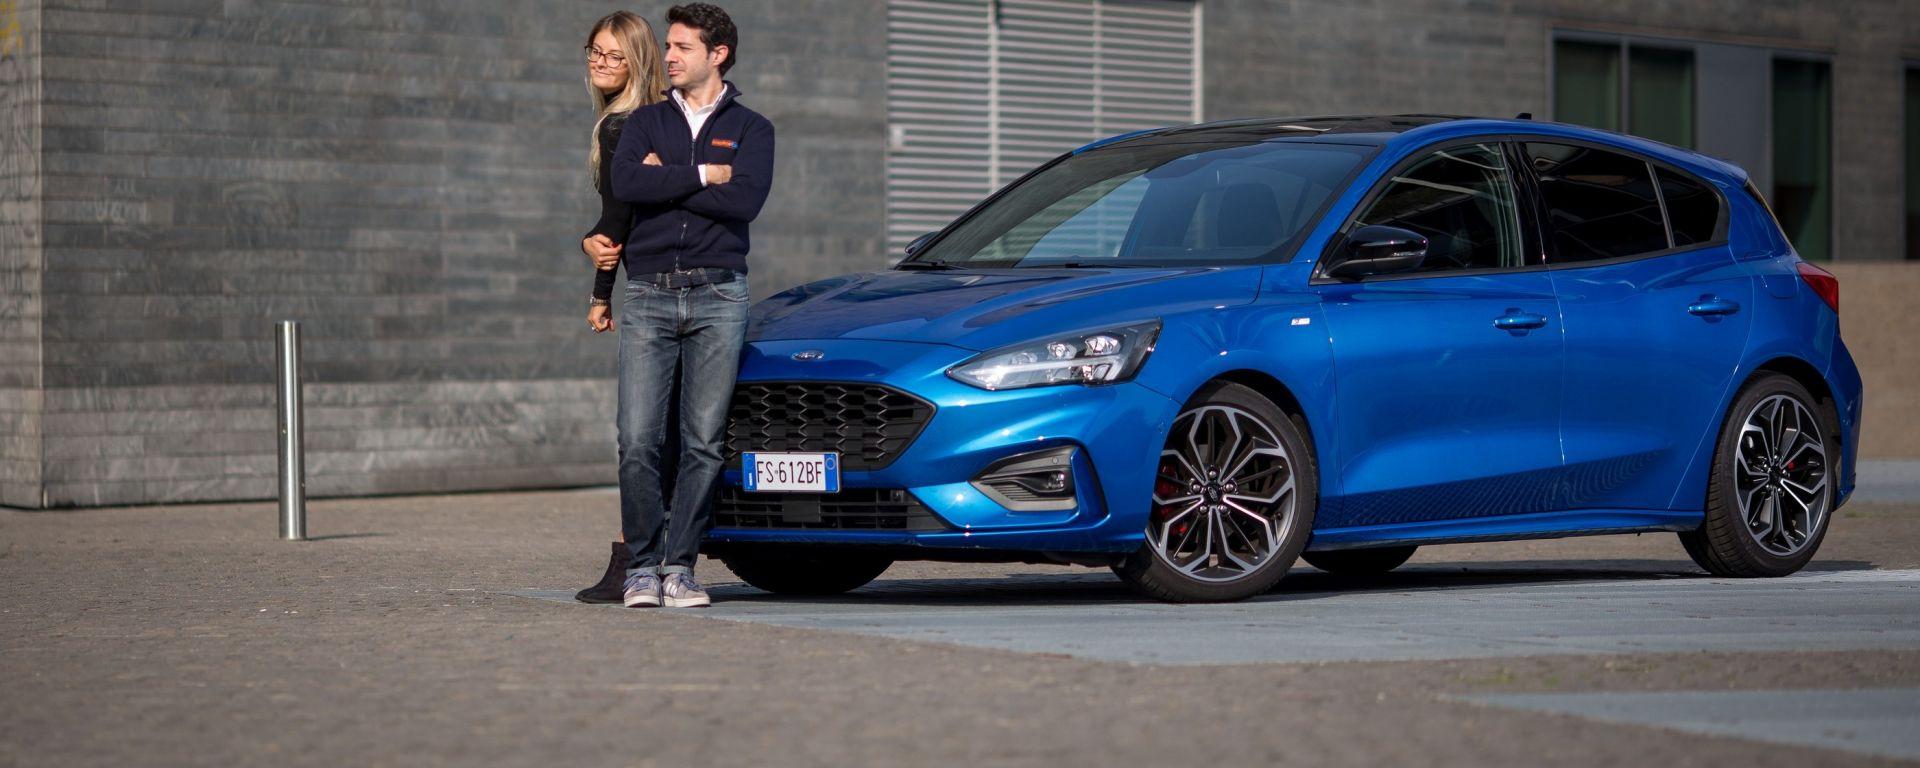 Ford Focus ST Line: look sportivo e QI altissimo, ma Giulia...